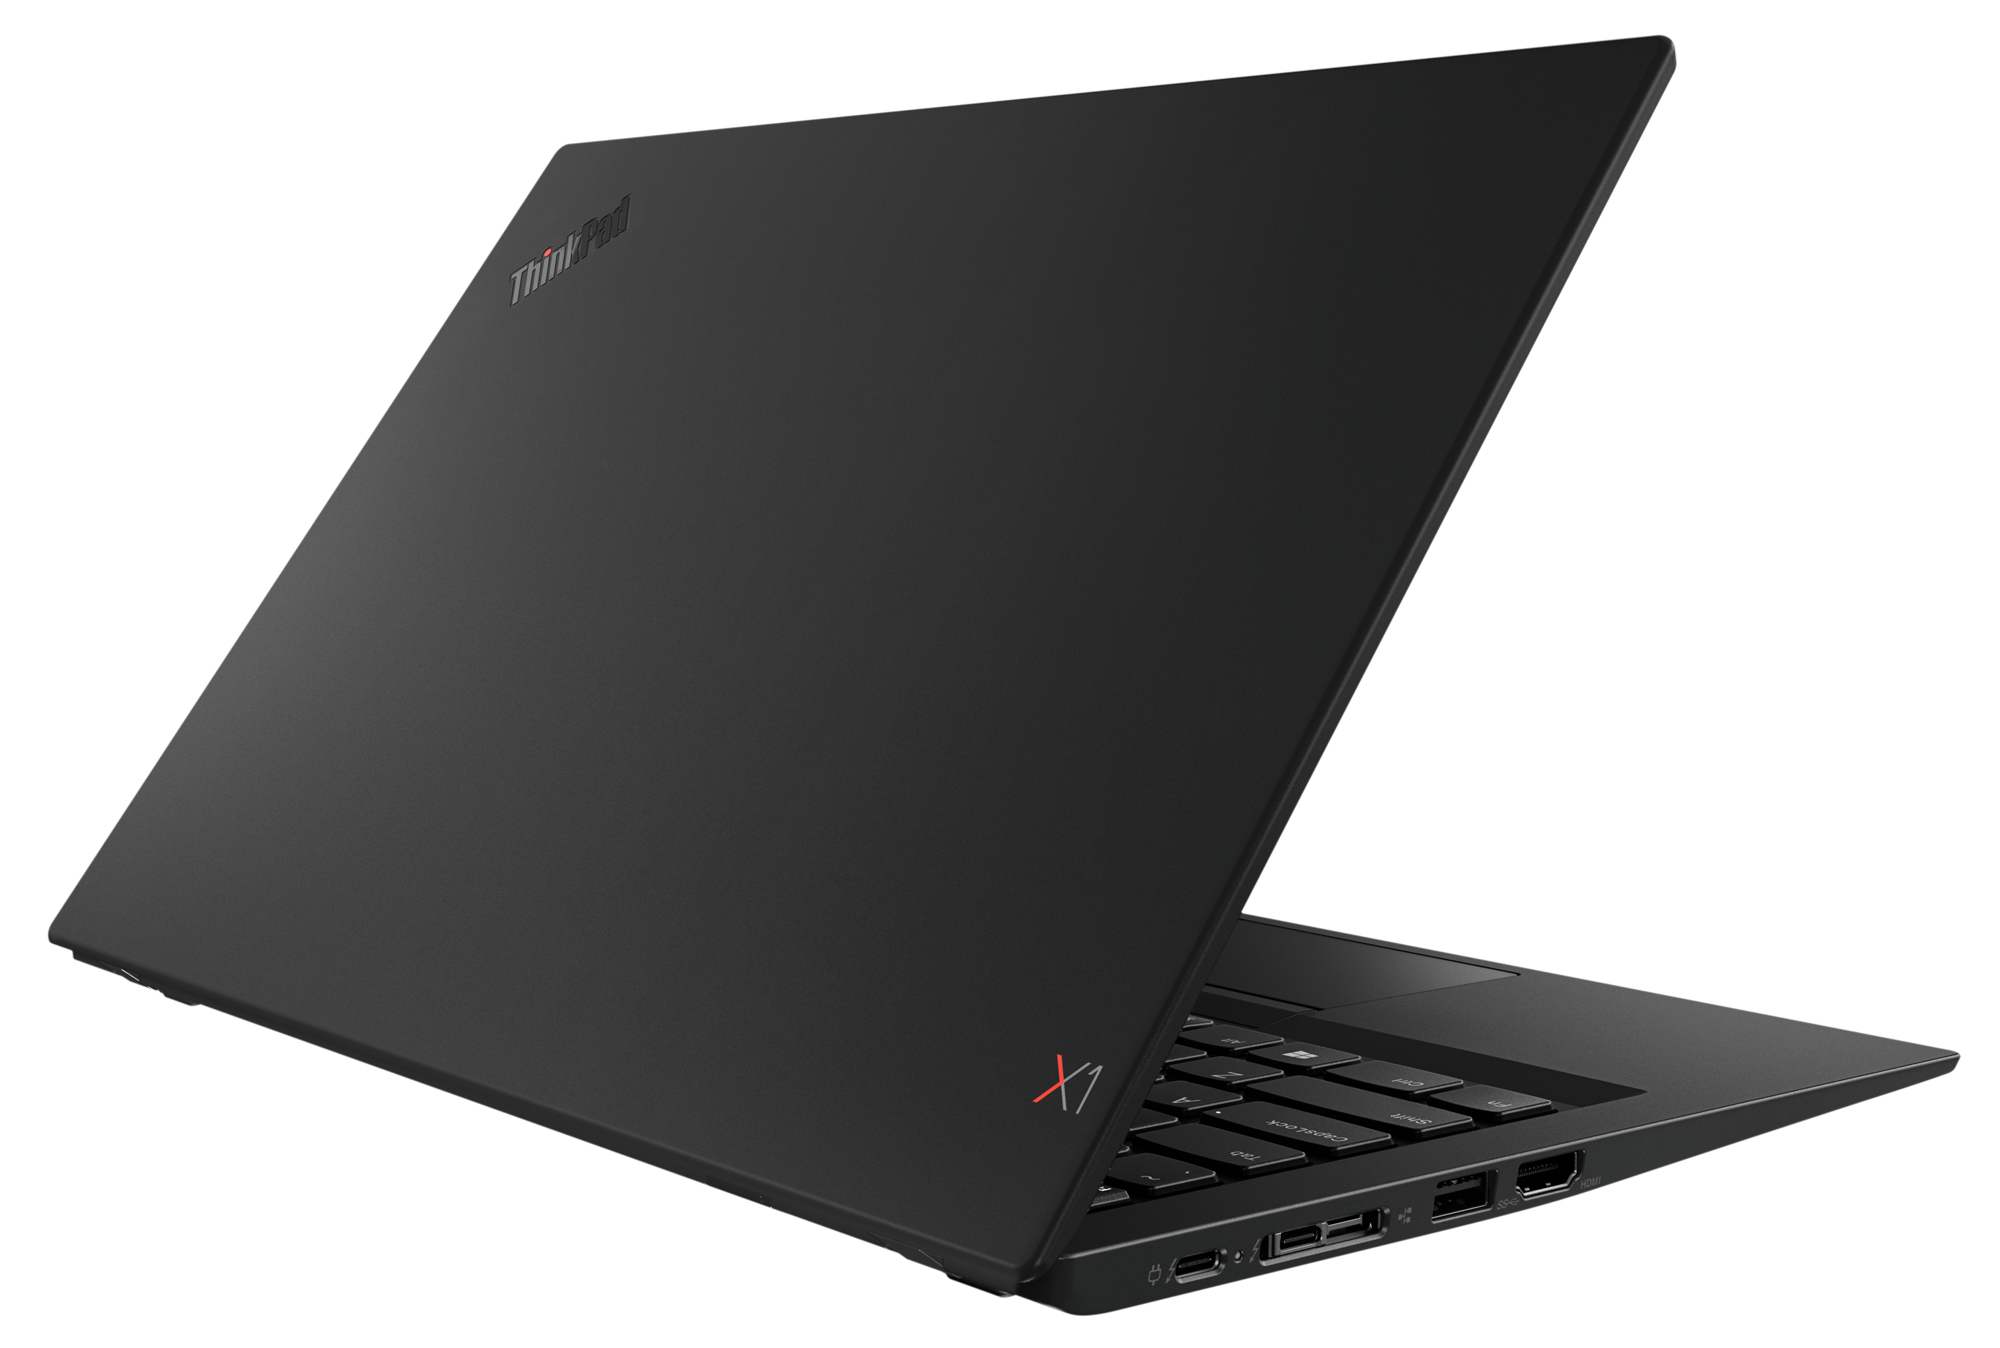 Фото  Ультрабук ThinkPad X1 Carbon 6th Gen (20KH0035RT)